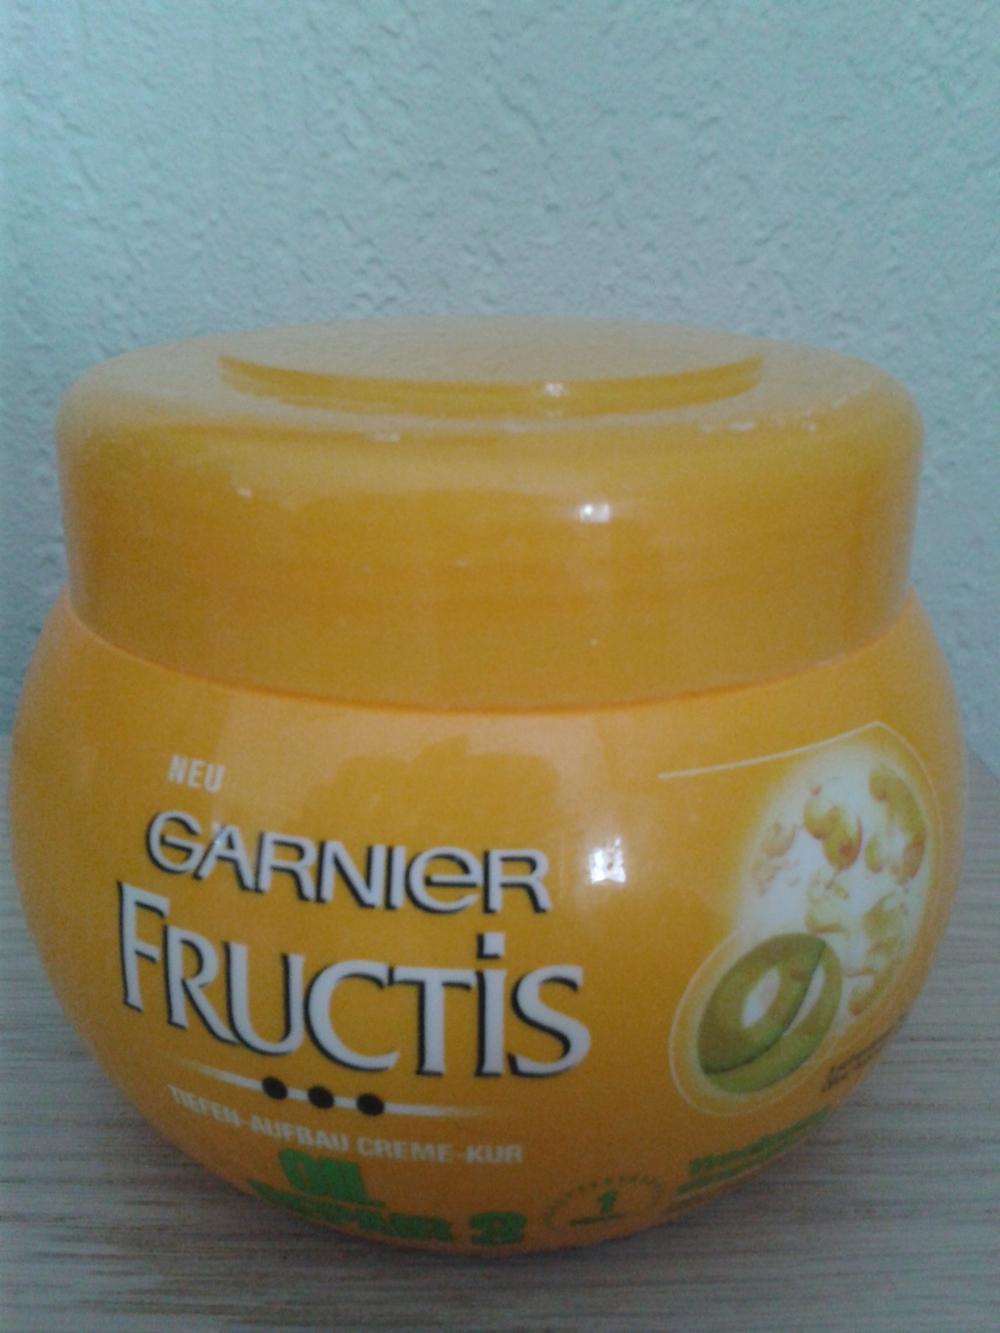 Mascarilla Fructis Garnier